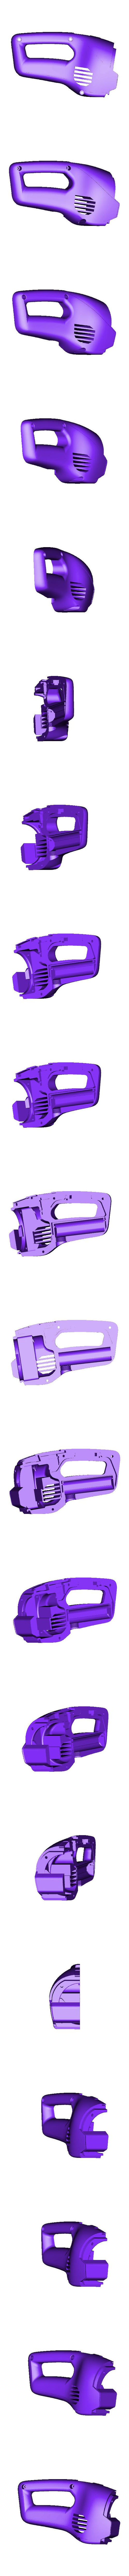 BODY_R.stl Download STL file Fully working toy vacuum cleaner  • 3D printable design, kozakm